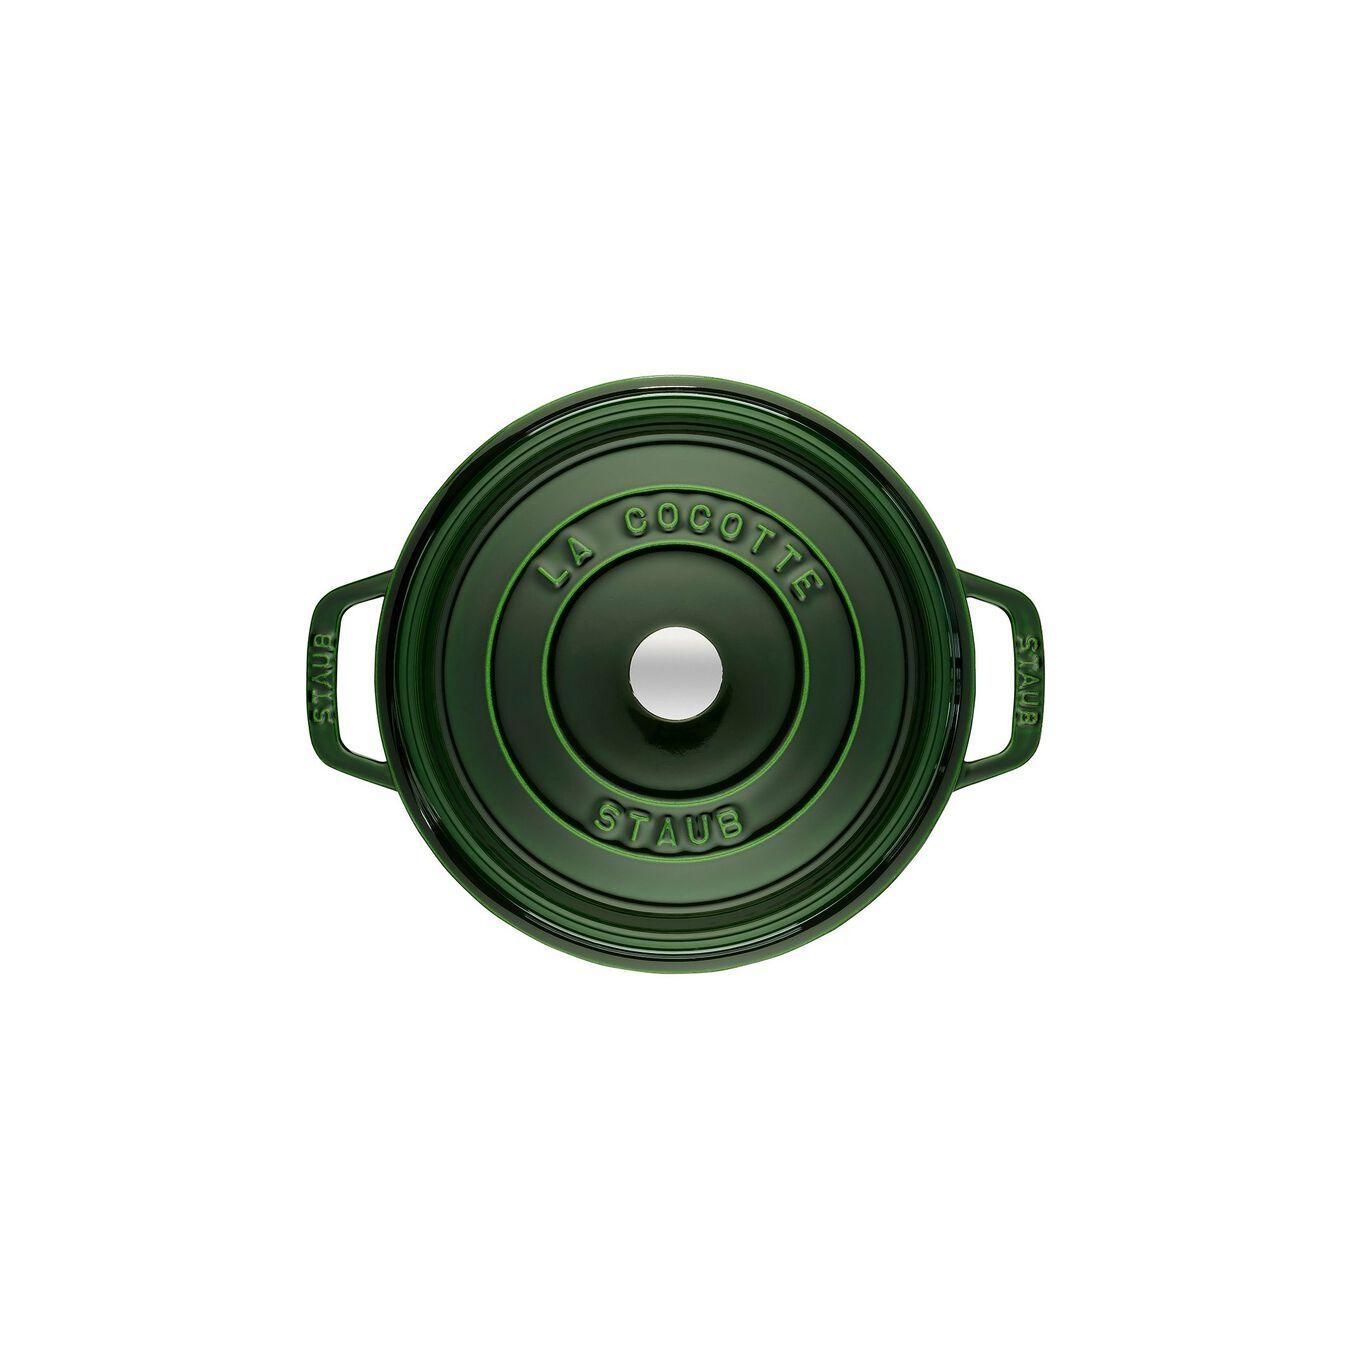 Cocotte 24 cm, rund, Basilikum-Grün, Gusseisen,,large 2